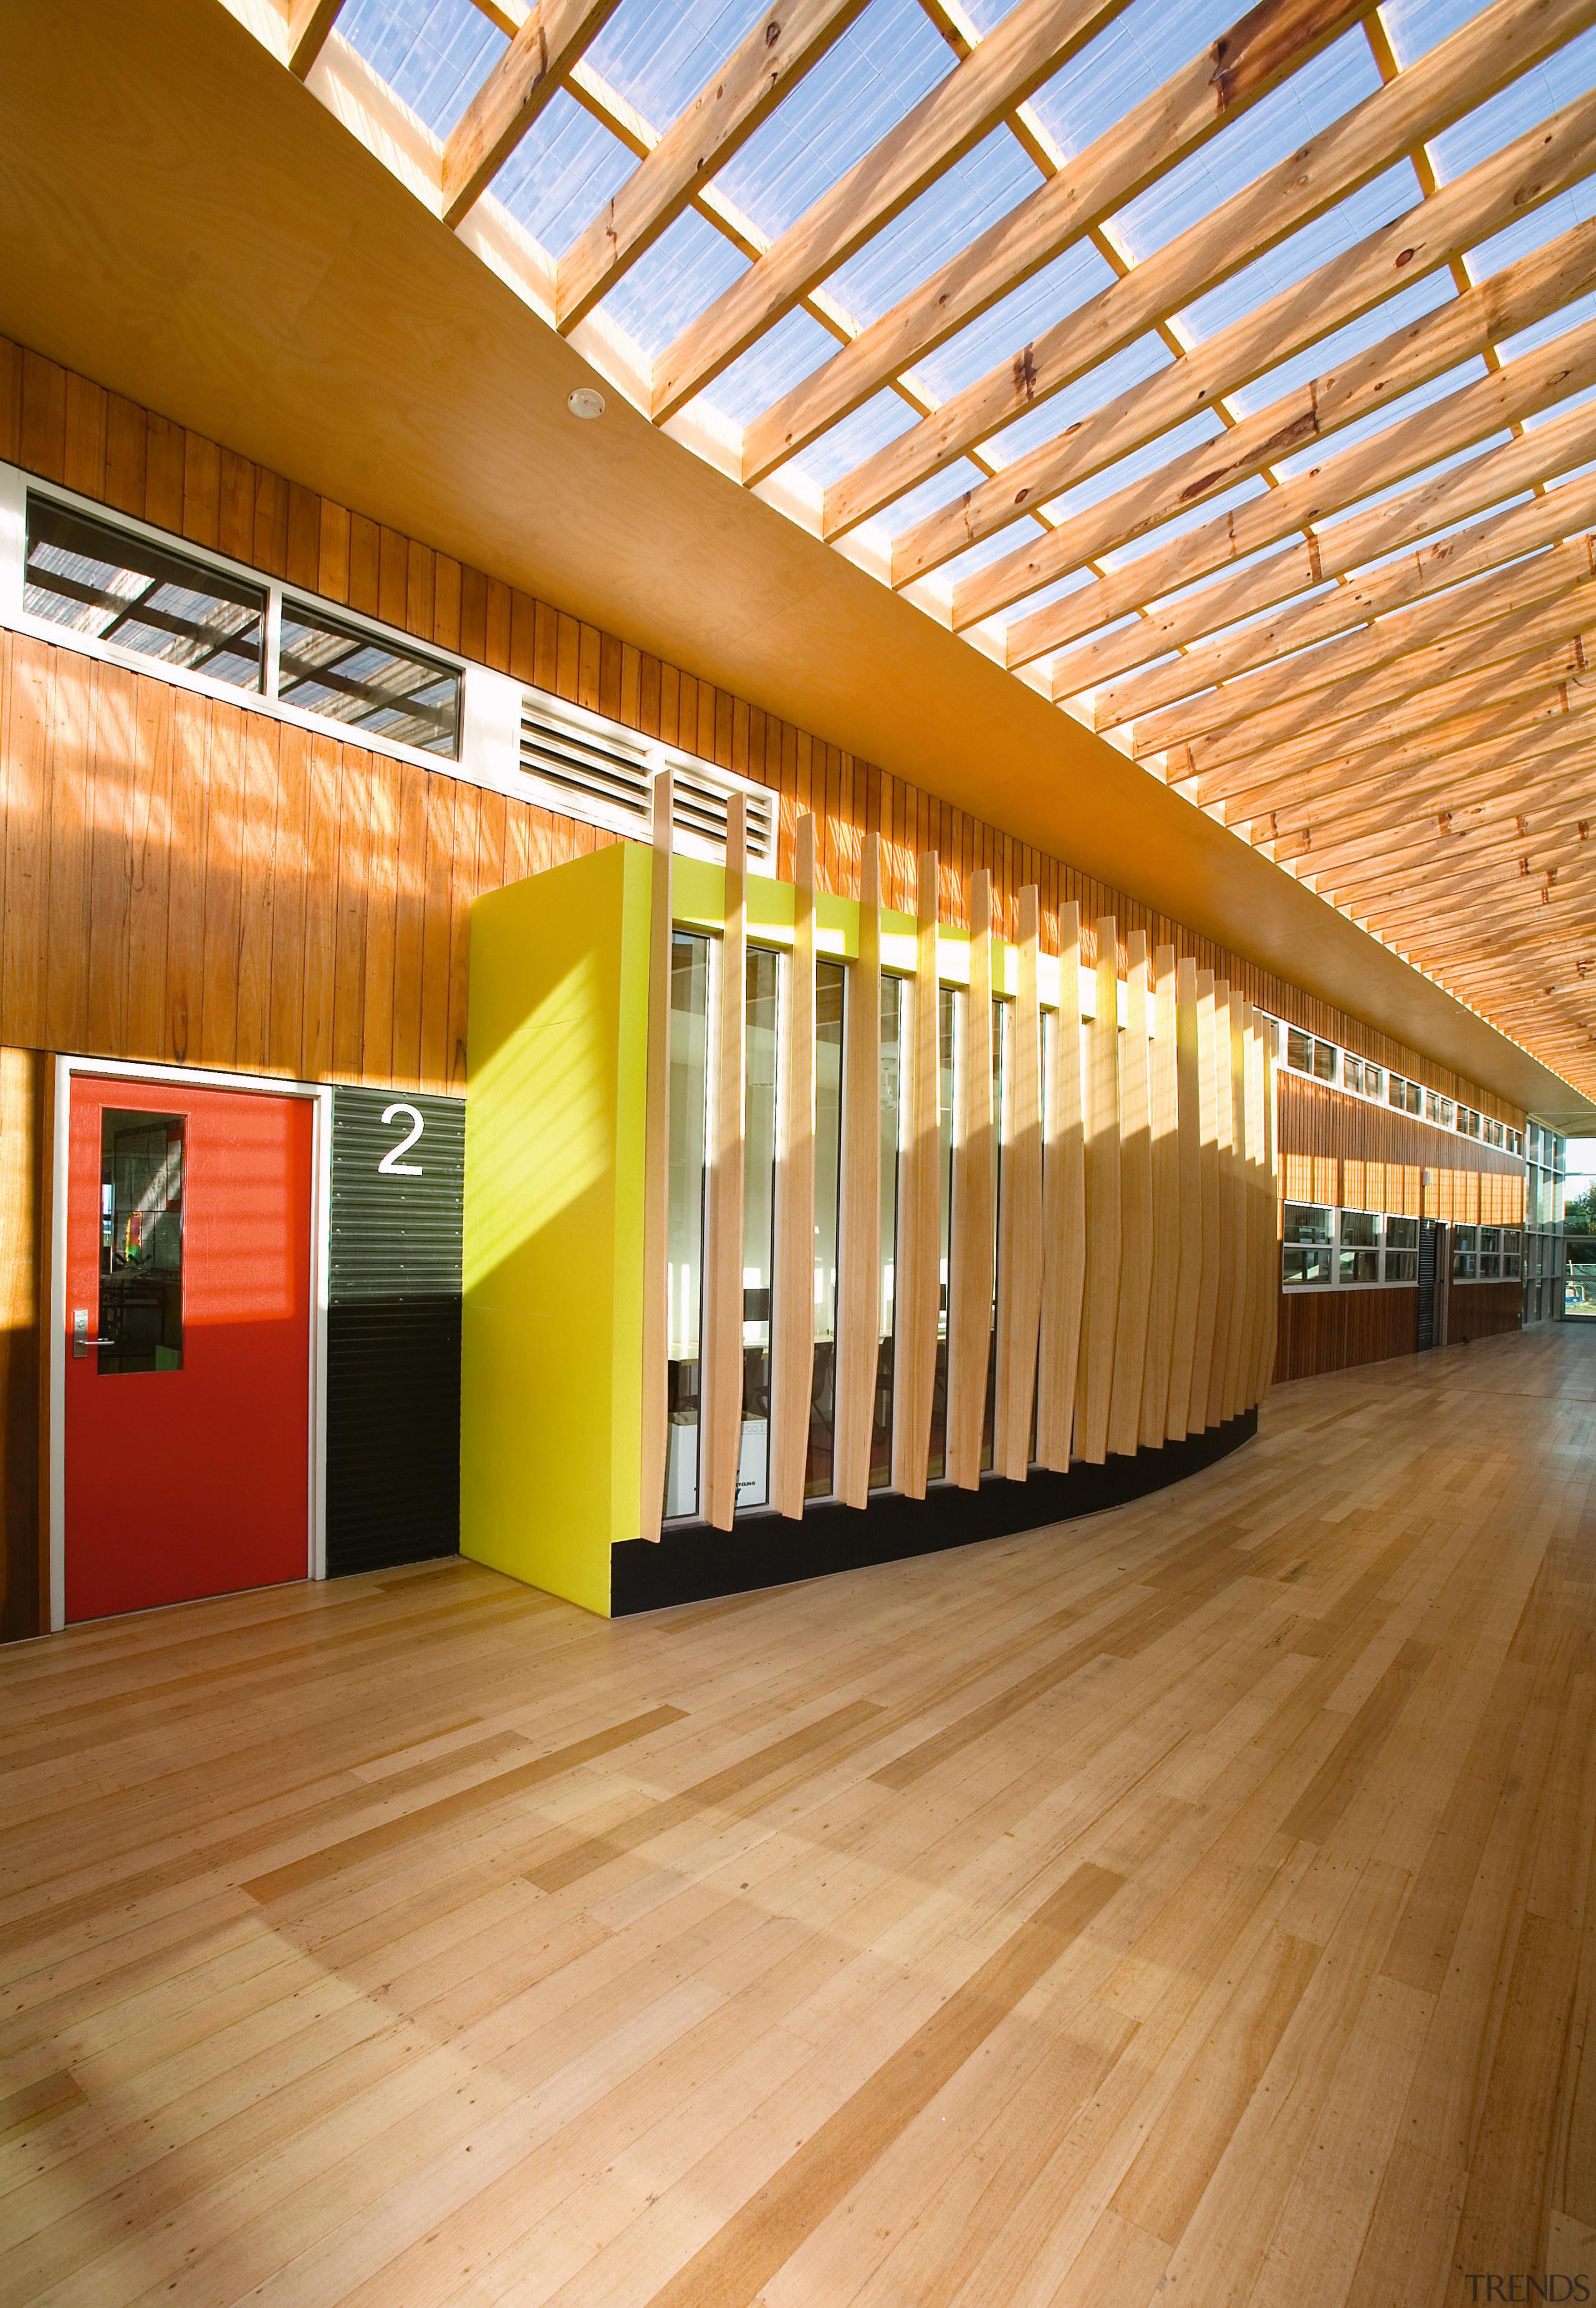 View of Williamstown High School in Melbourne. Designed architecture, ceiling, daylighting, floor, flooring, interior design, lobby, wood, orange, brown